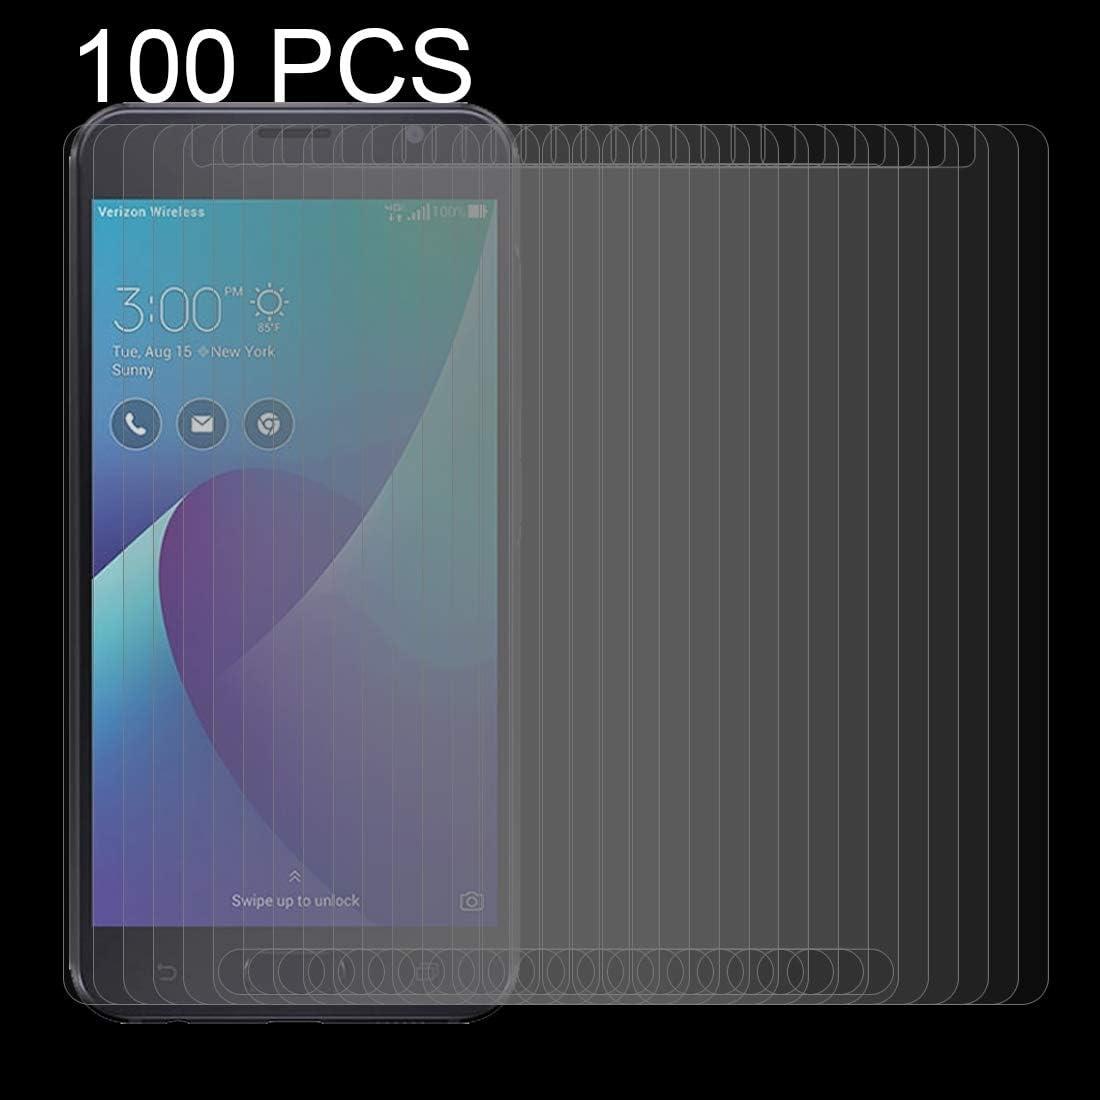 ZENGMING Tempered Glass Film Screen Protector XINGHCEN 100 PCS for Asus ZenFone V V520KL 0.26mm 9H Surface Hardness 2.5D Curved Edge Tempered Glass Screen Protector Anti-Scratch